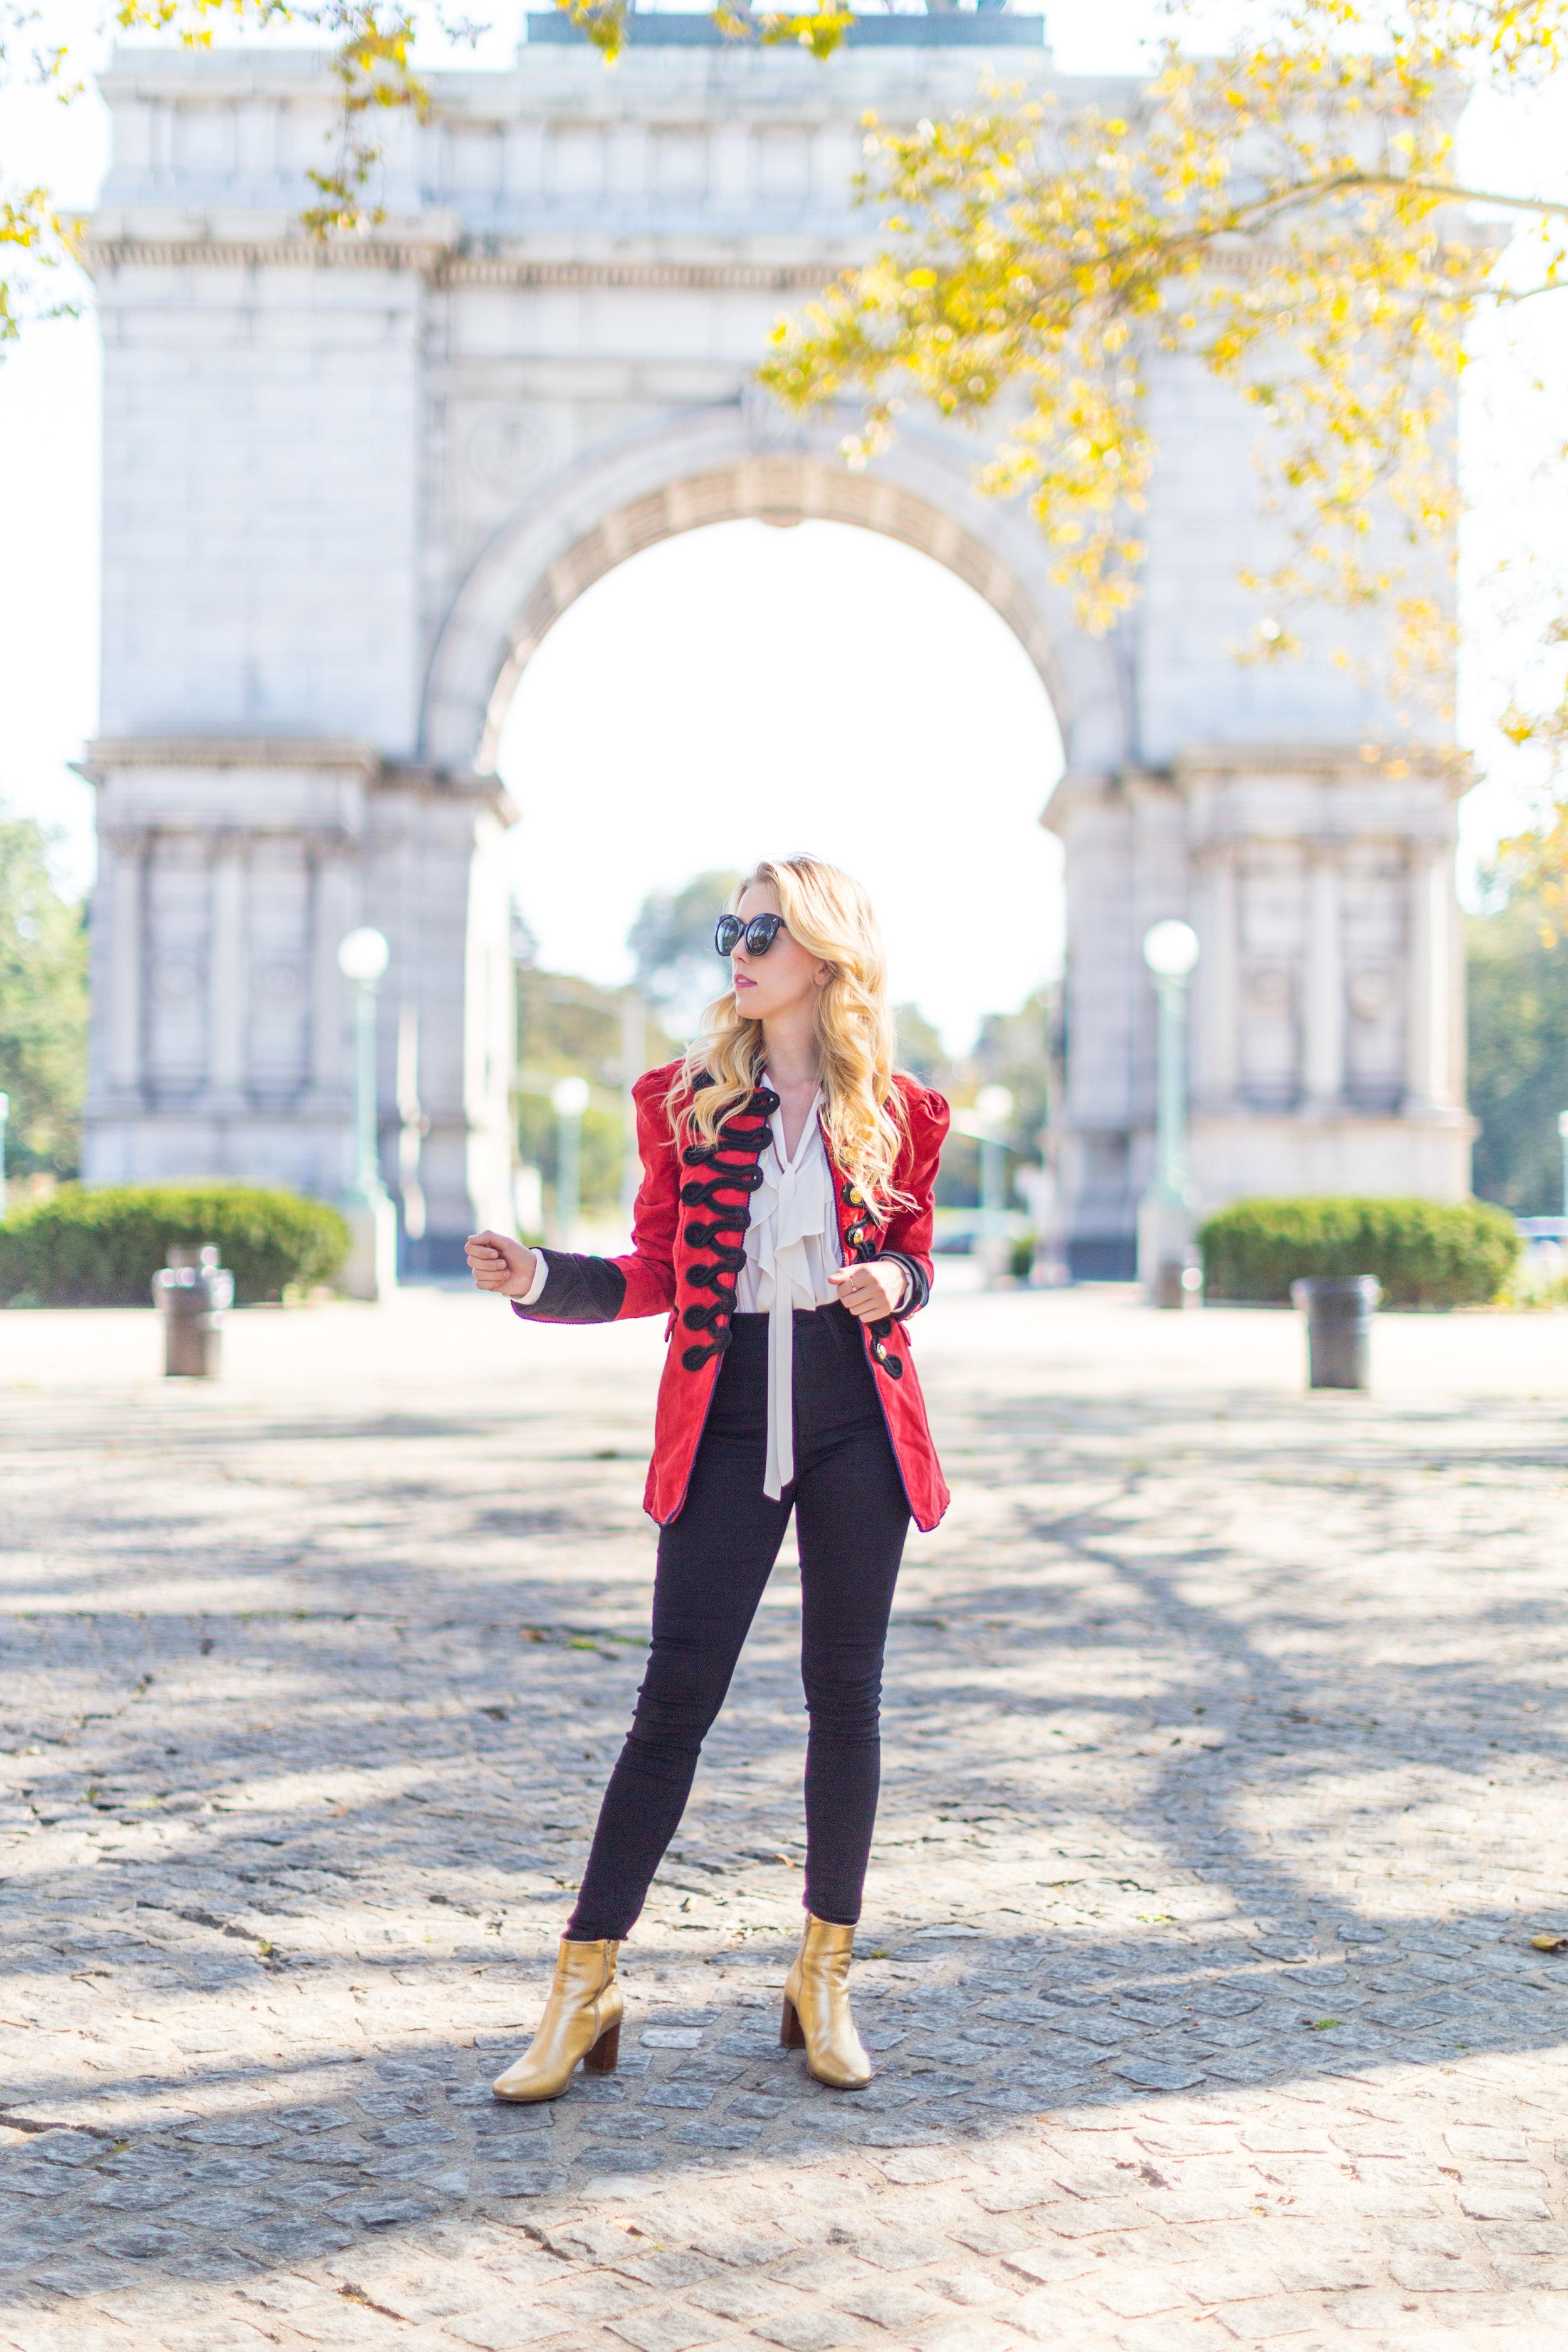 Fall Fashion Red Band Jacket Trendy-8.jpg